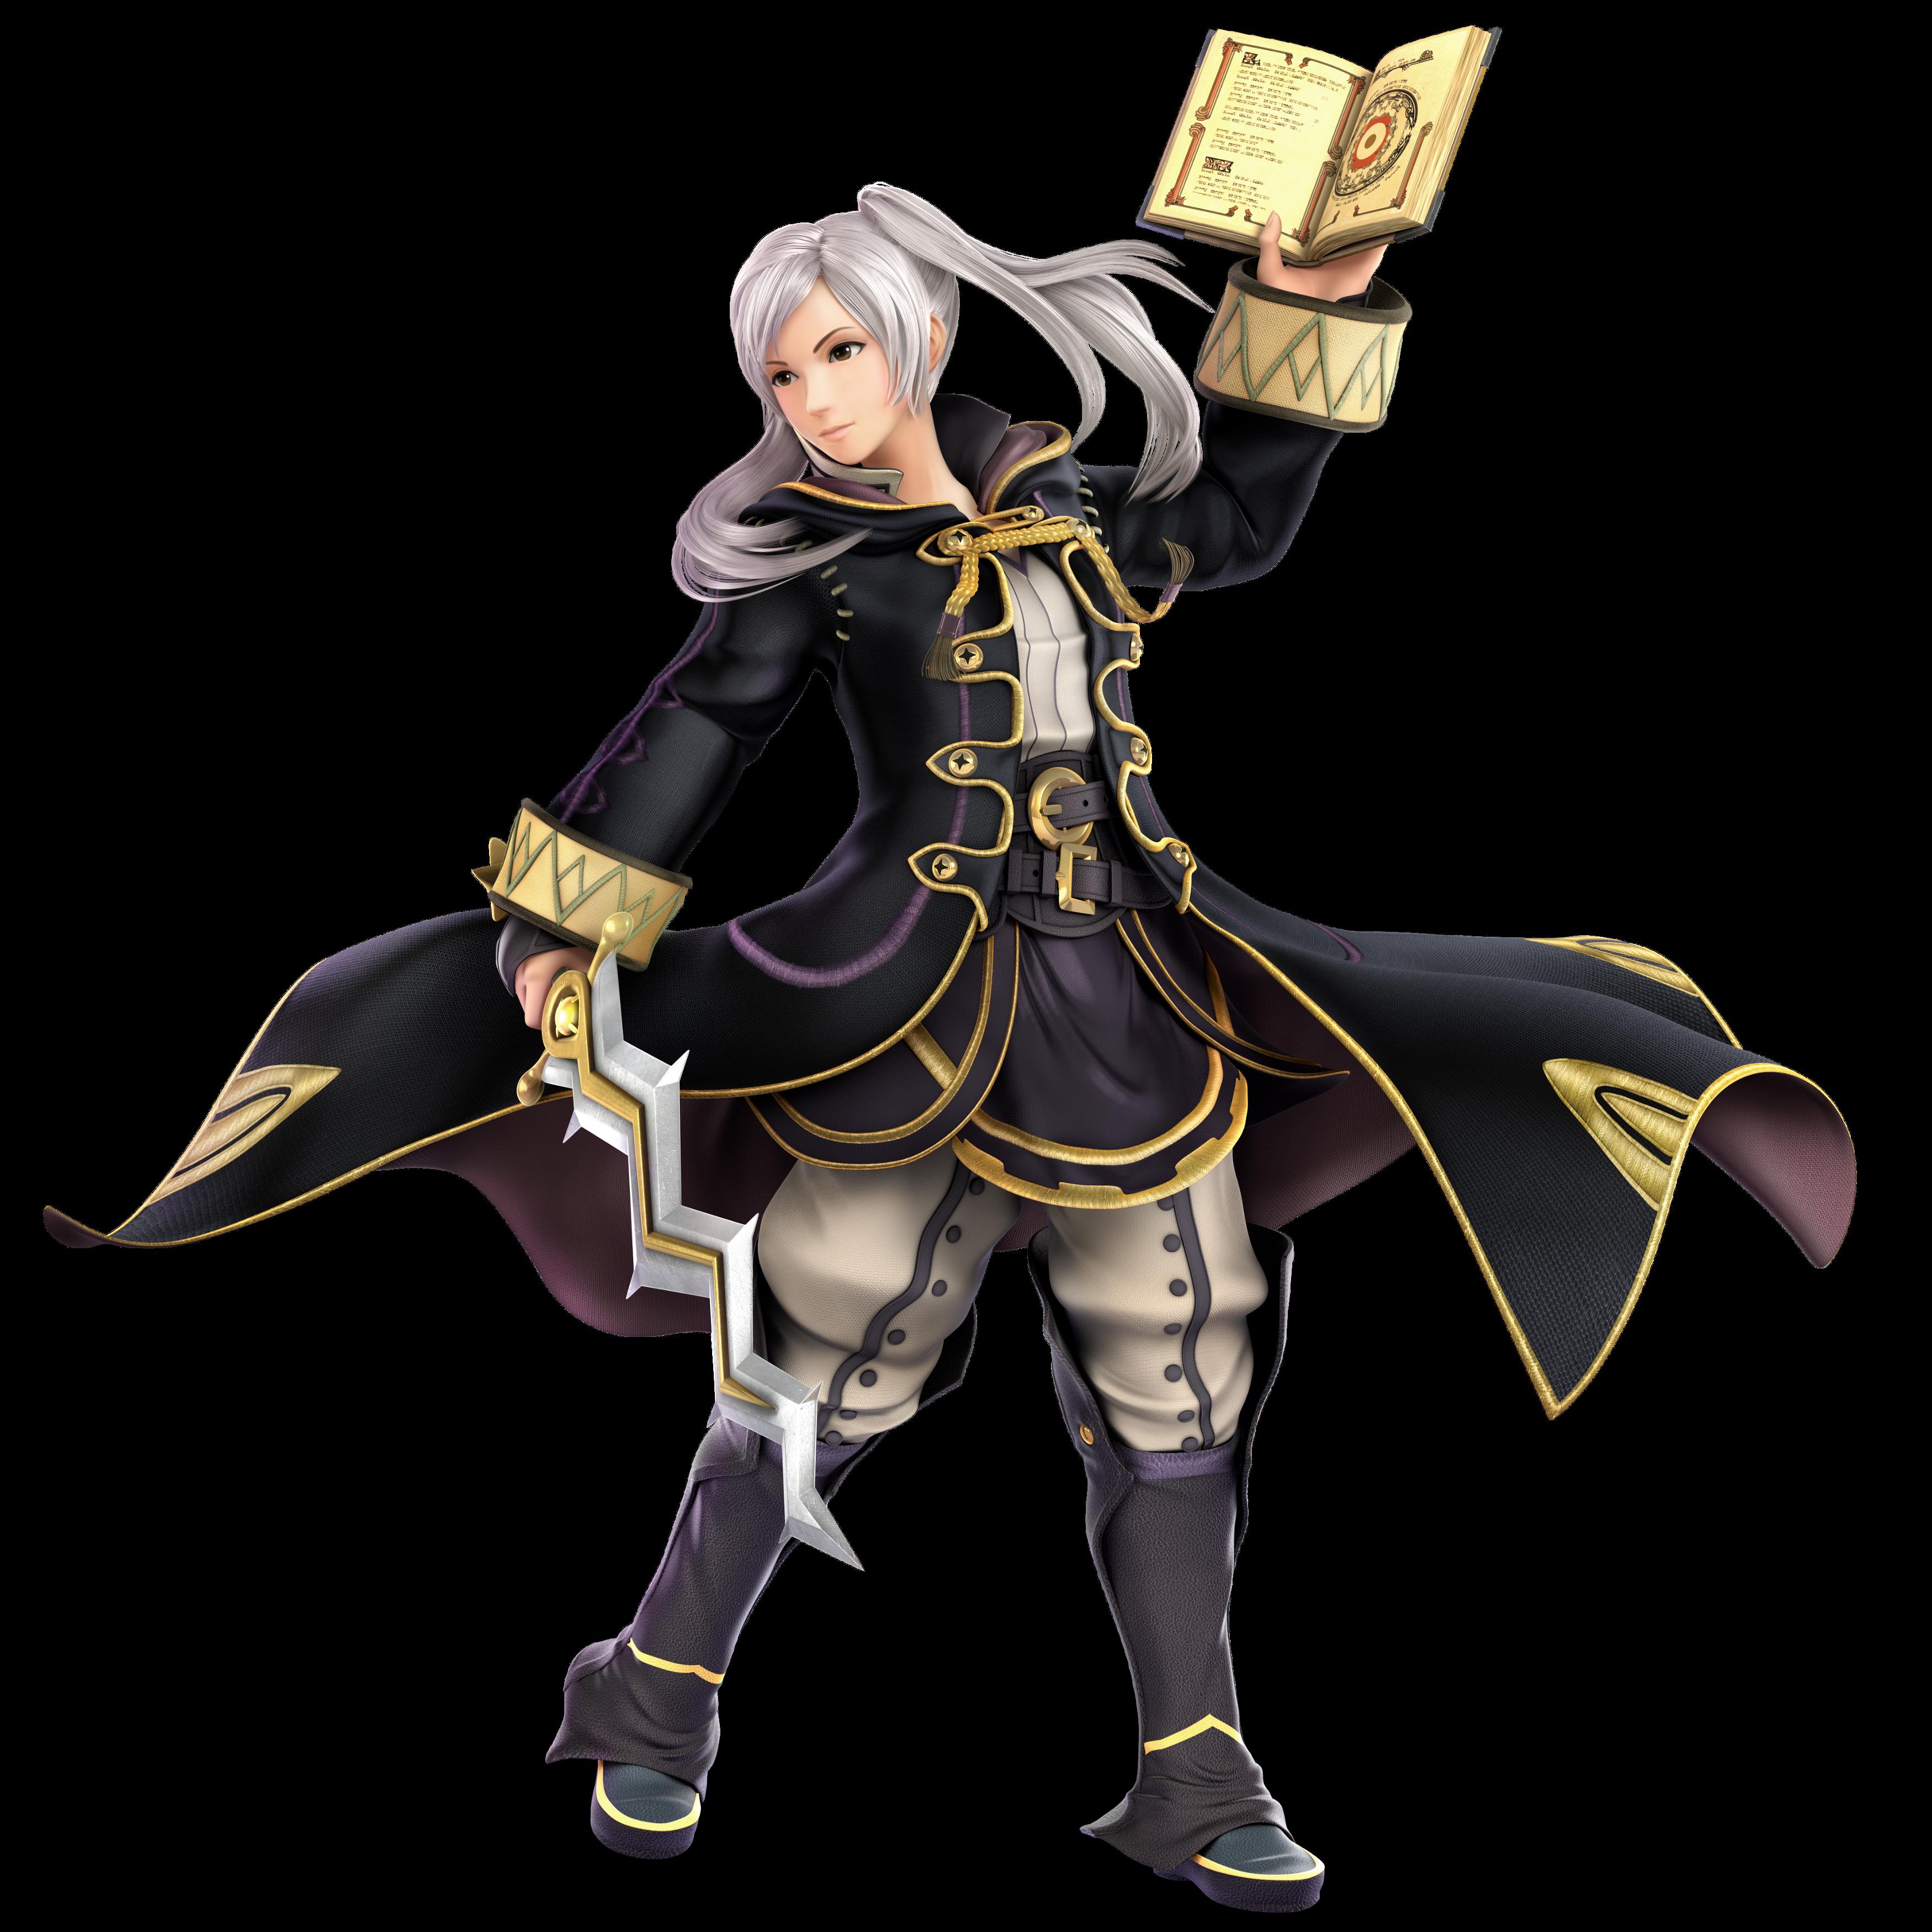 Robin (Super Smash Bros. Ultimate)